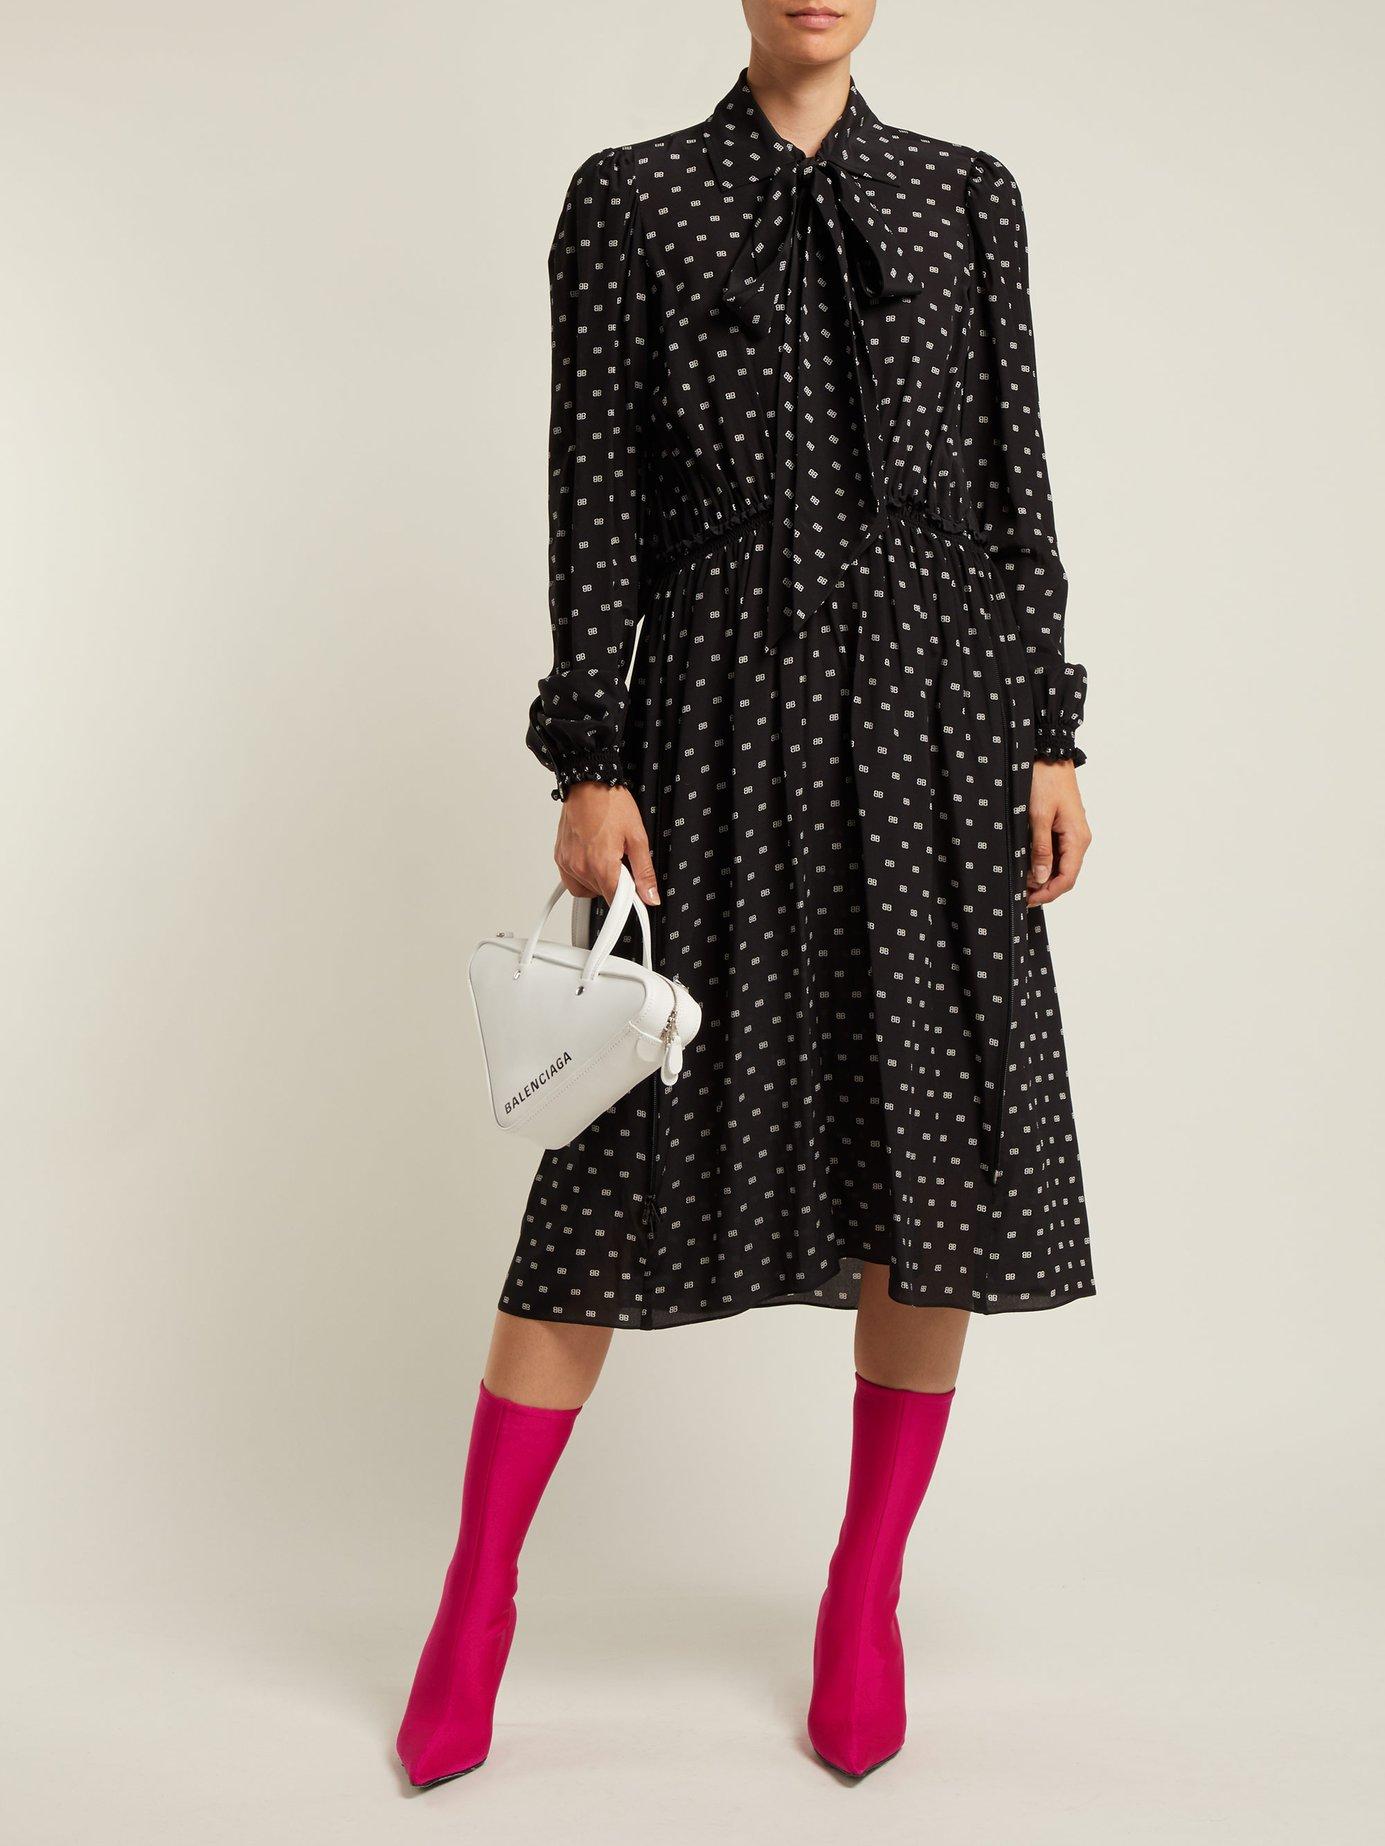 Reverence BB-print tie-neck silk dress by Balenciaga